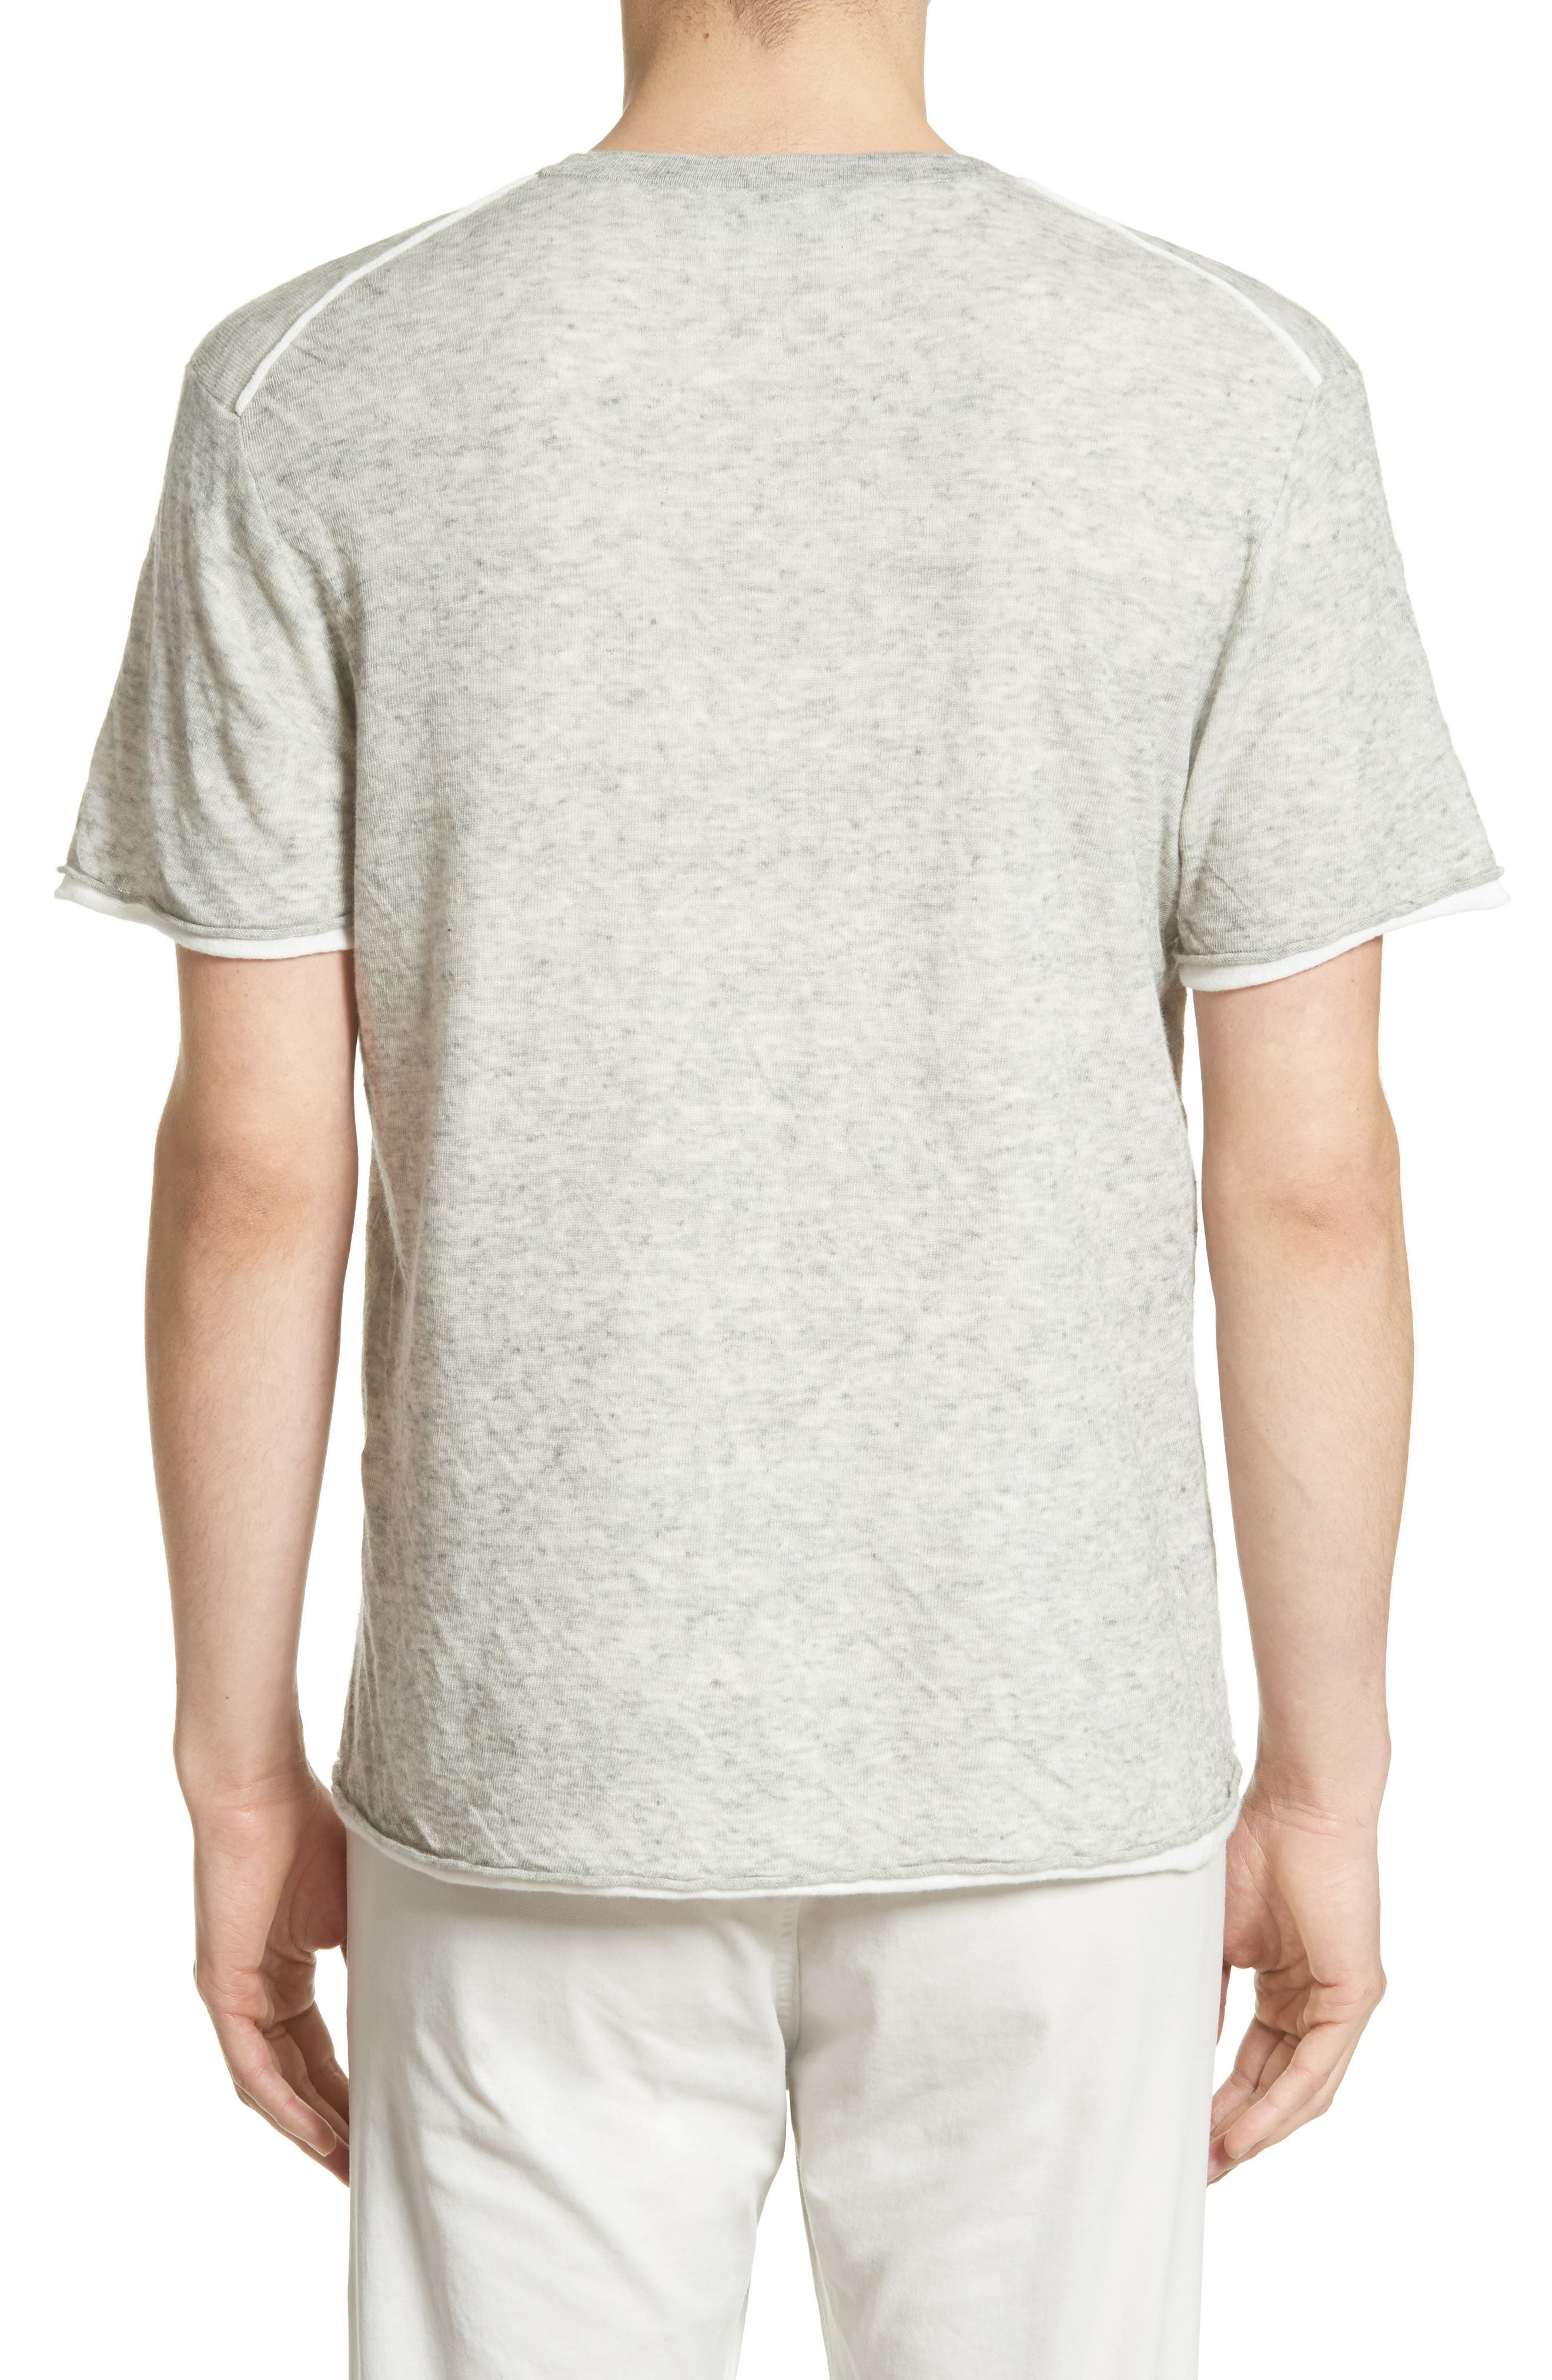 Tripp Cotton & Wool T-Shirt,                             Alternate thumbnail 2, color,                             068